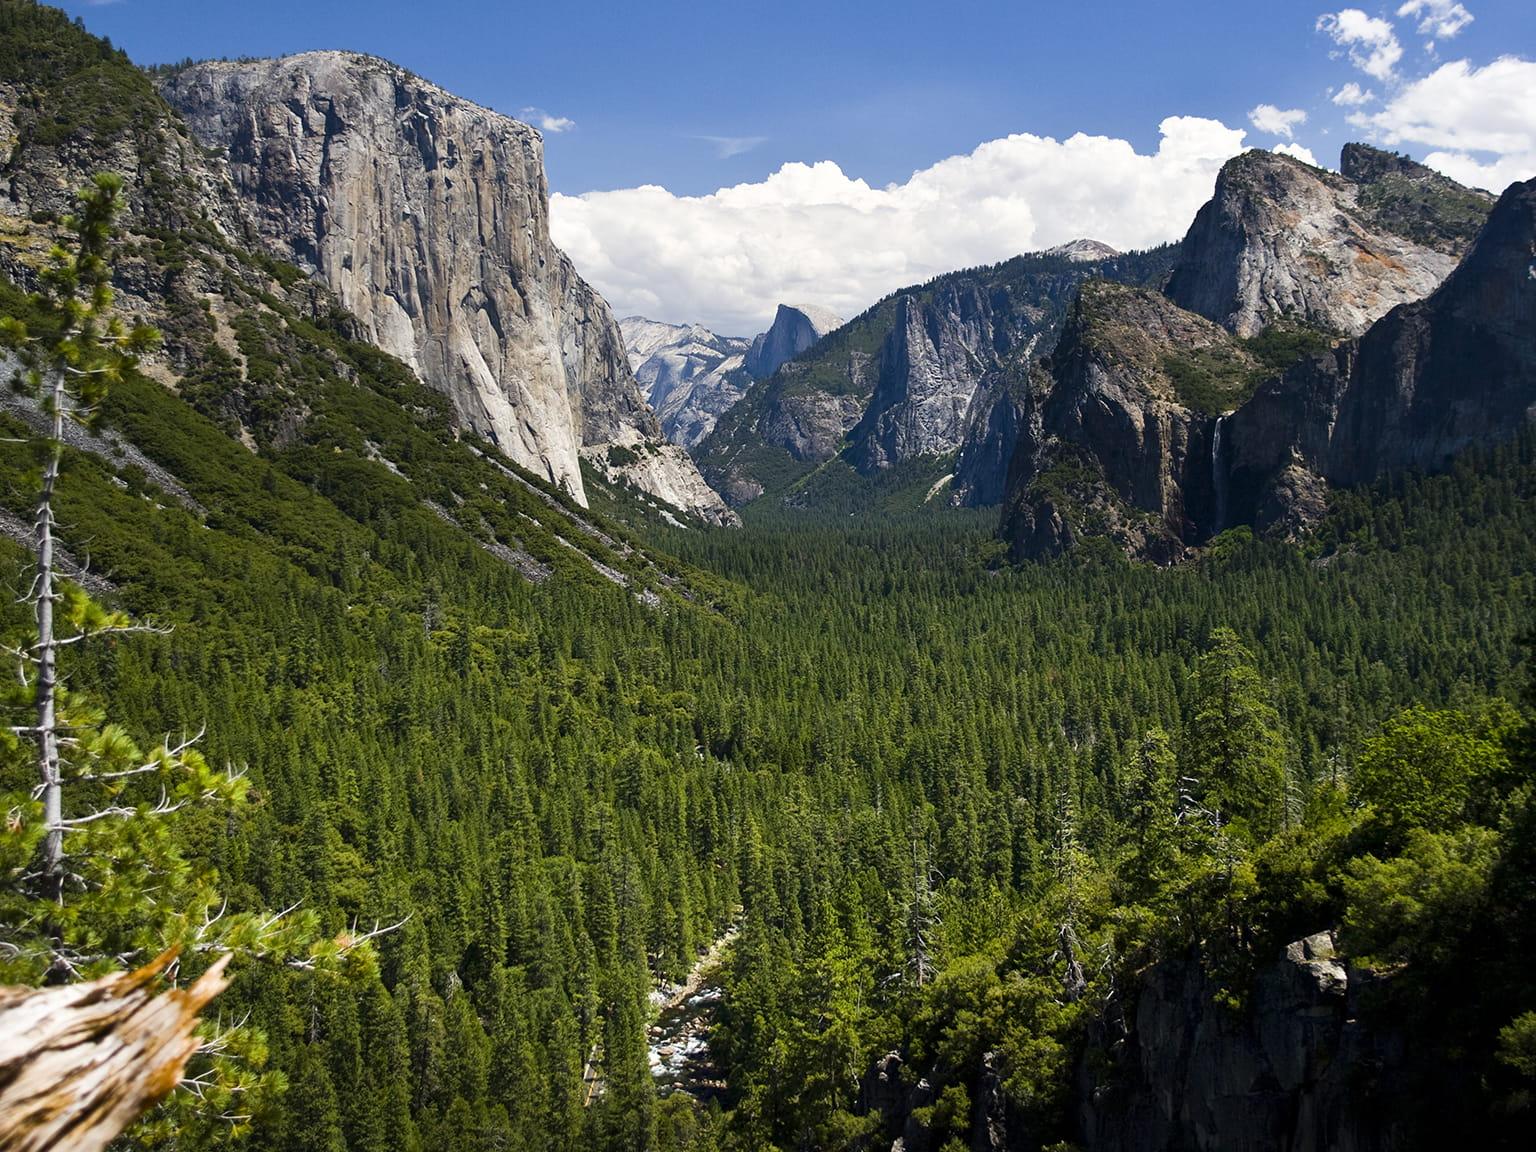 Obloha údolí horského lesa